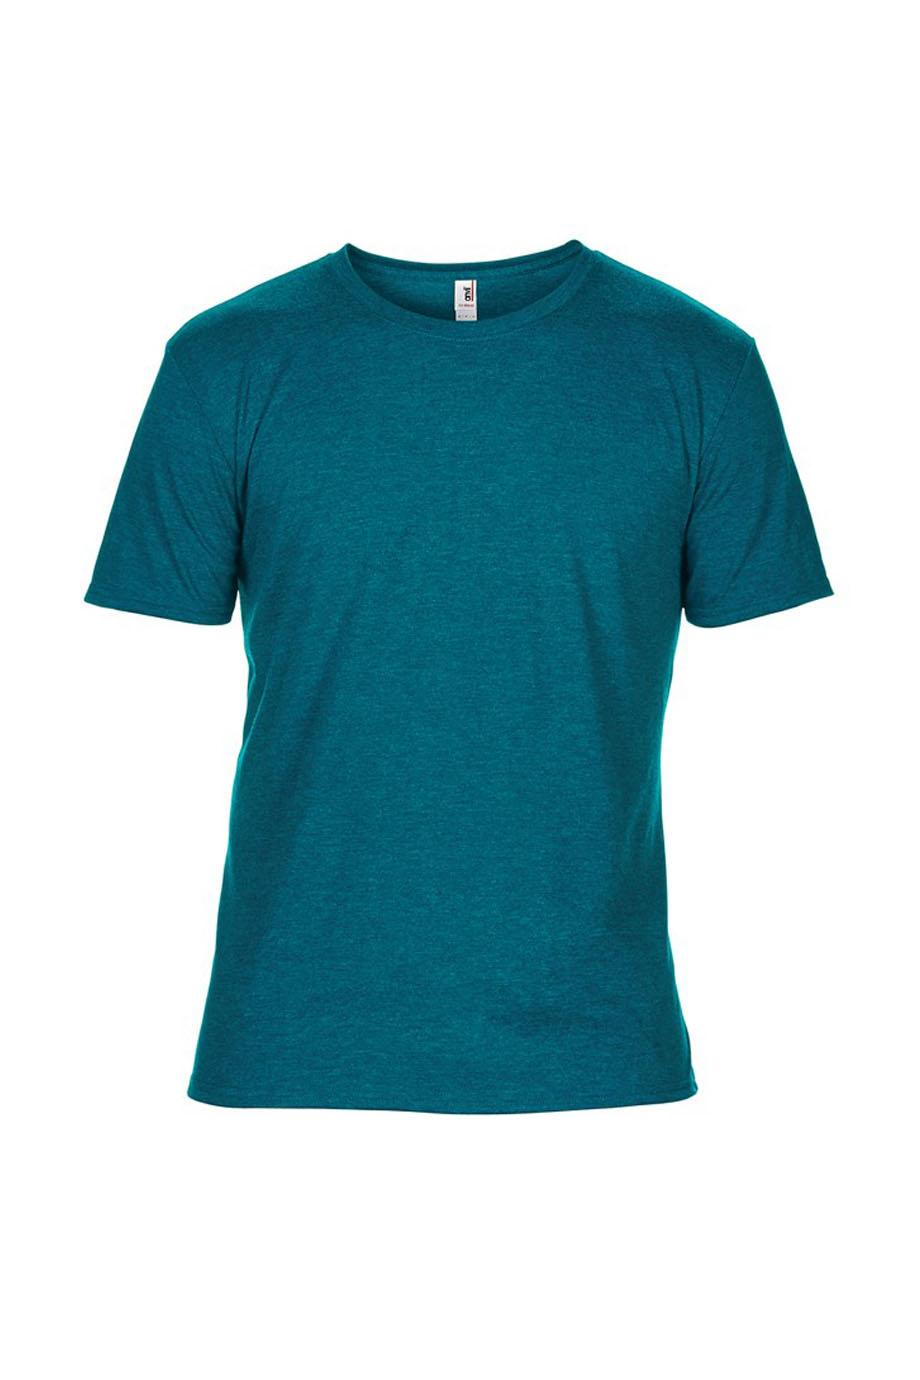 heather galapagos blue